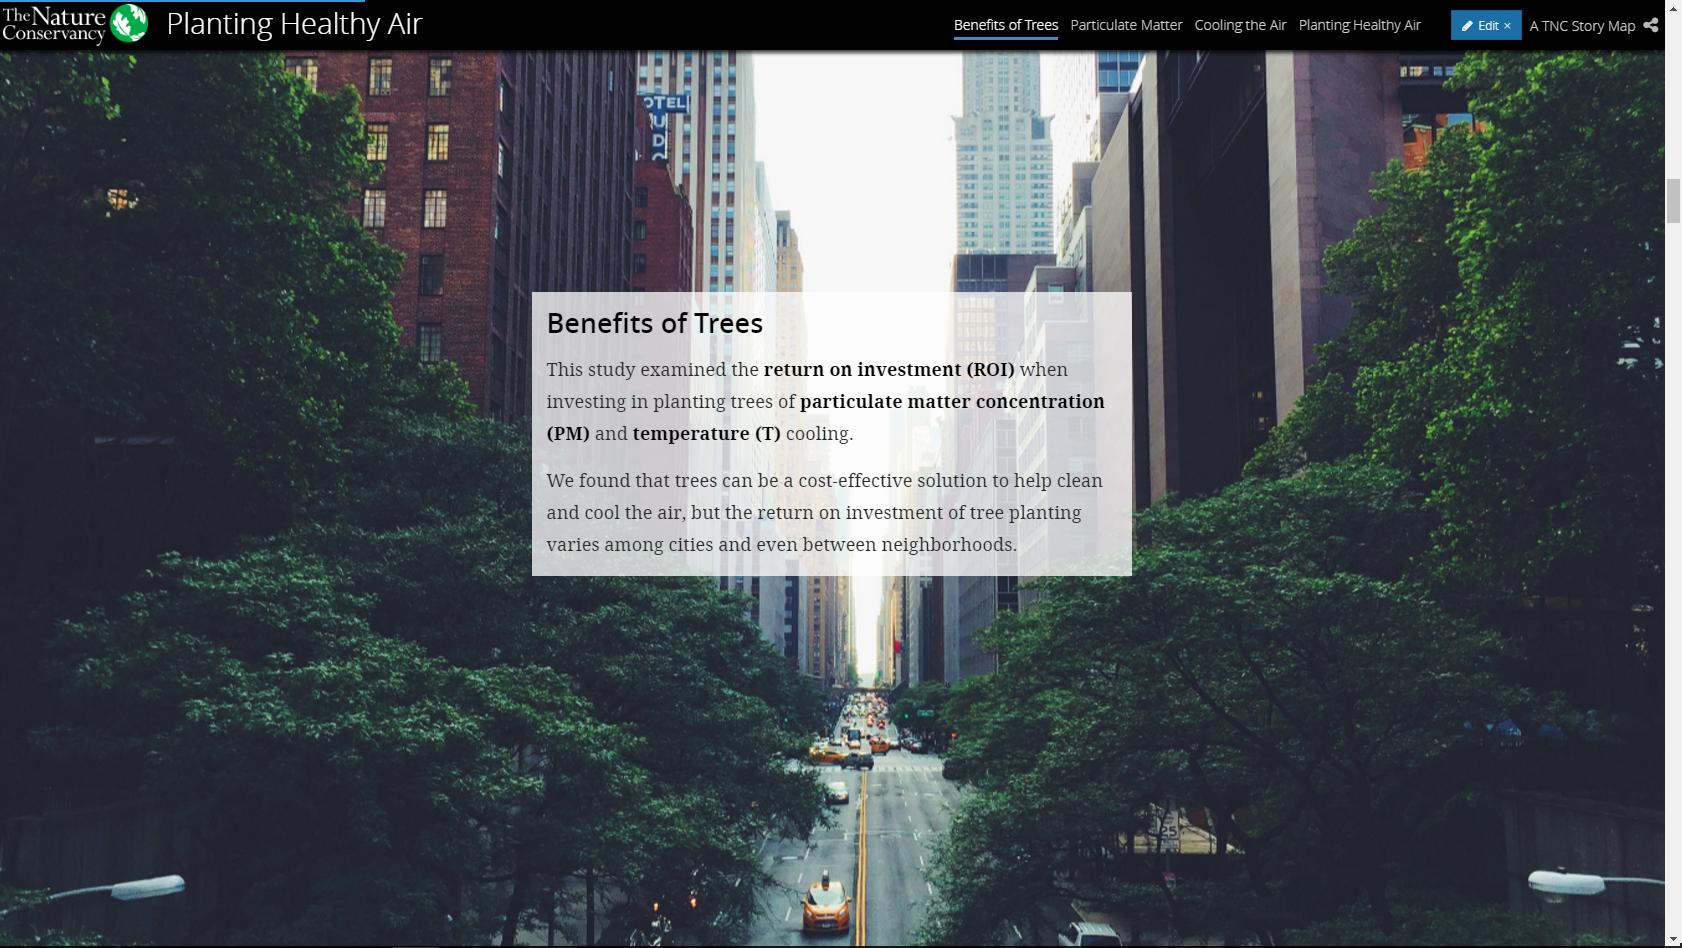 tncstorymap_benefitsoftrees